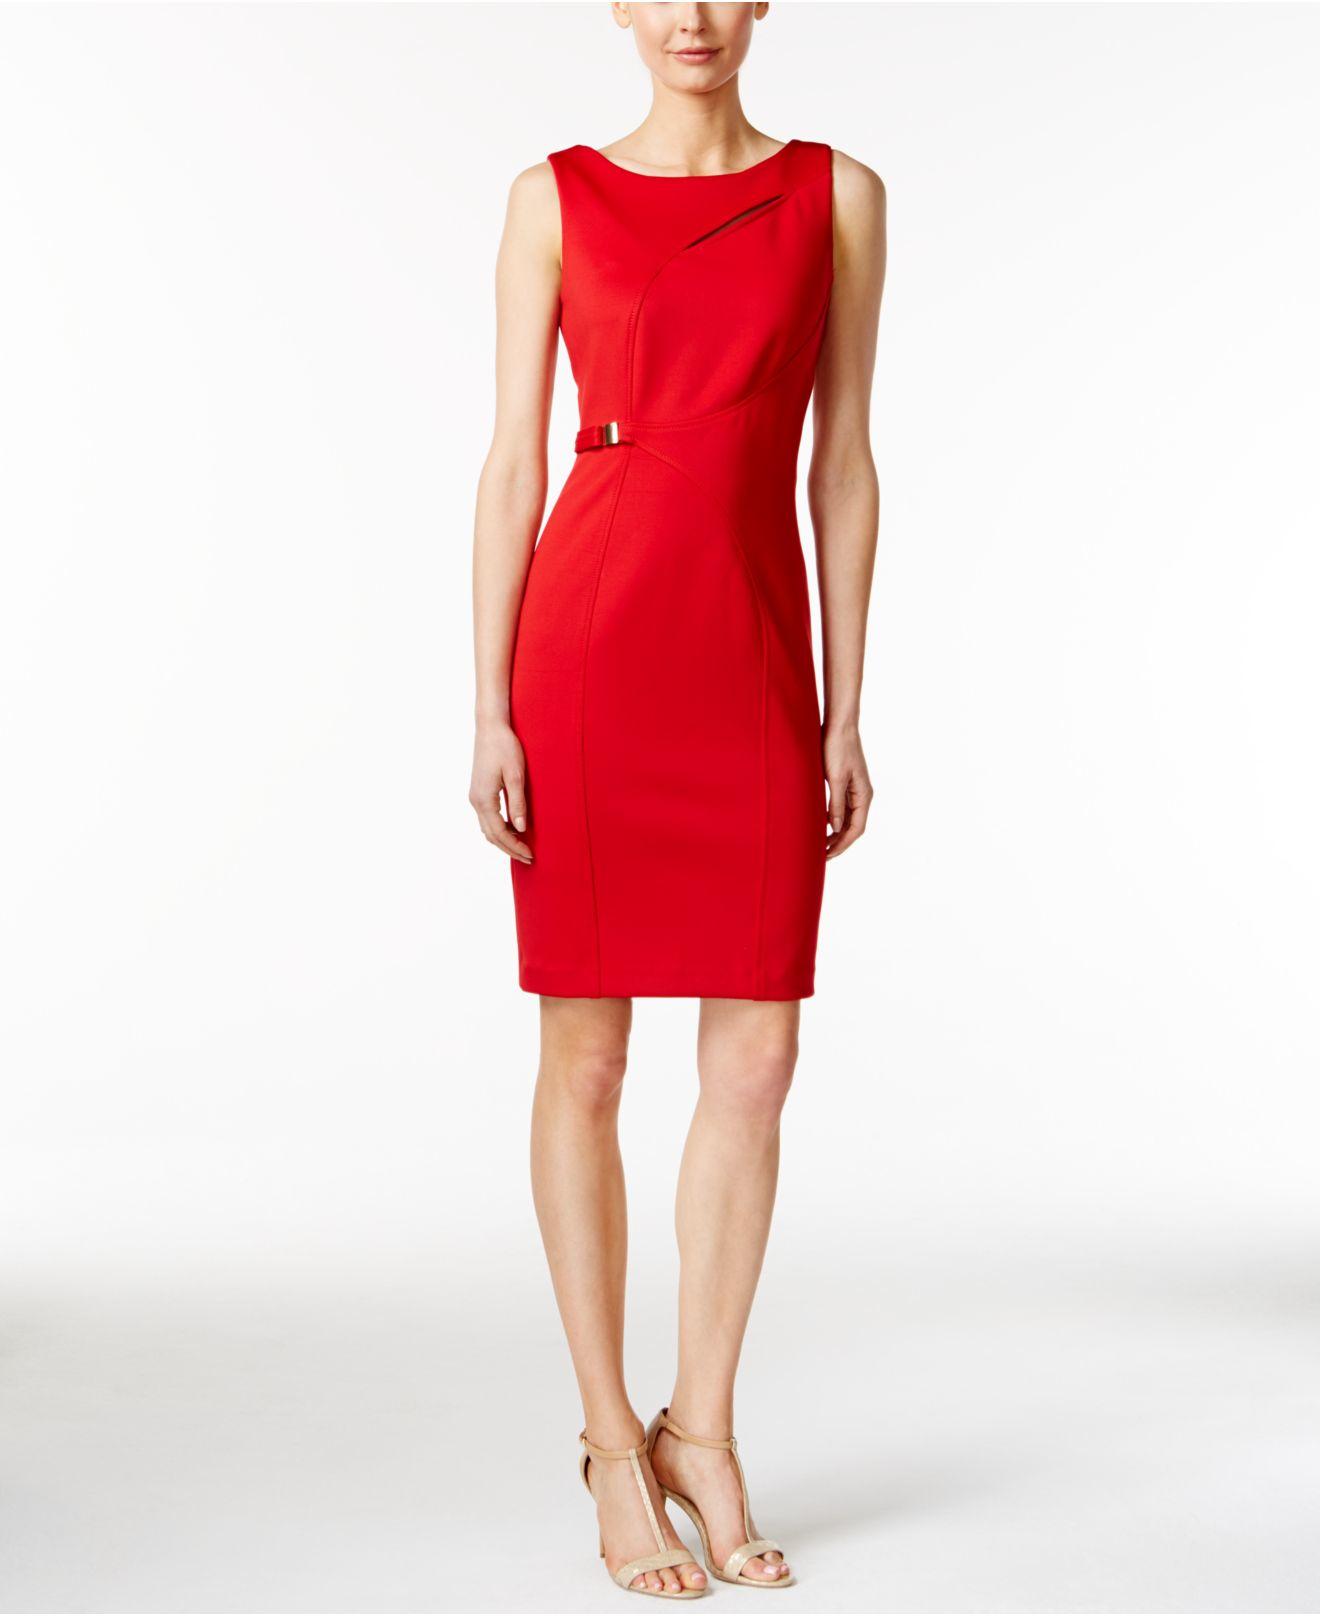 macys red dresses photo - 1